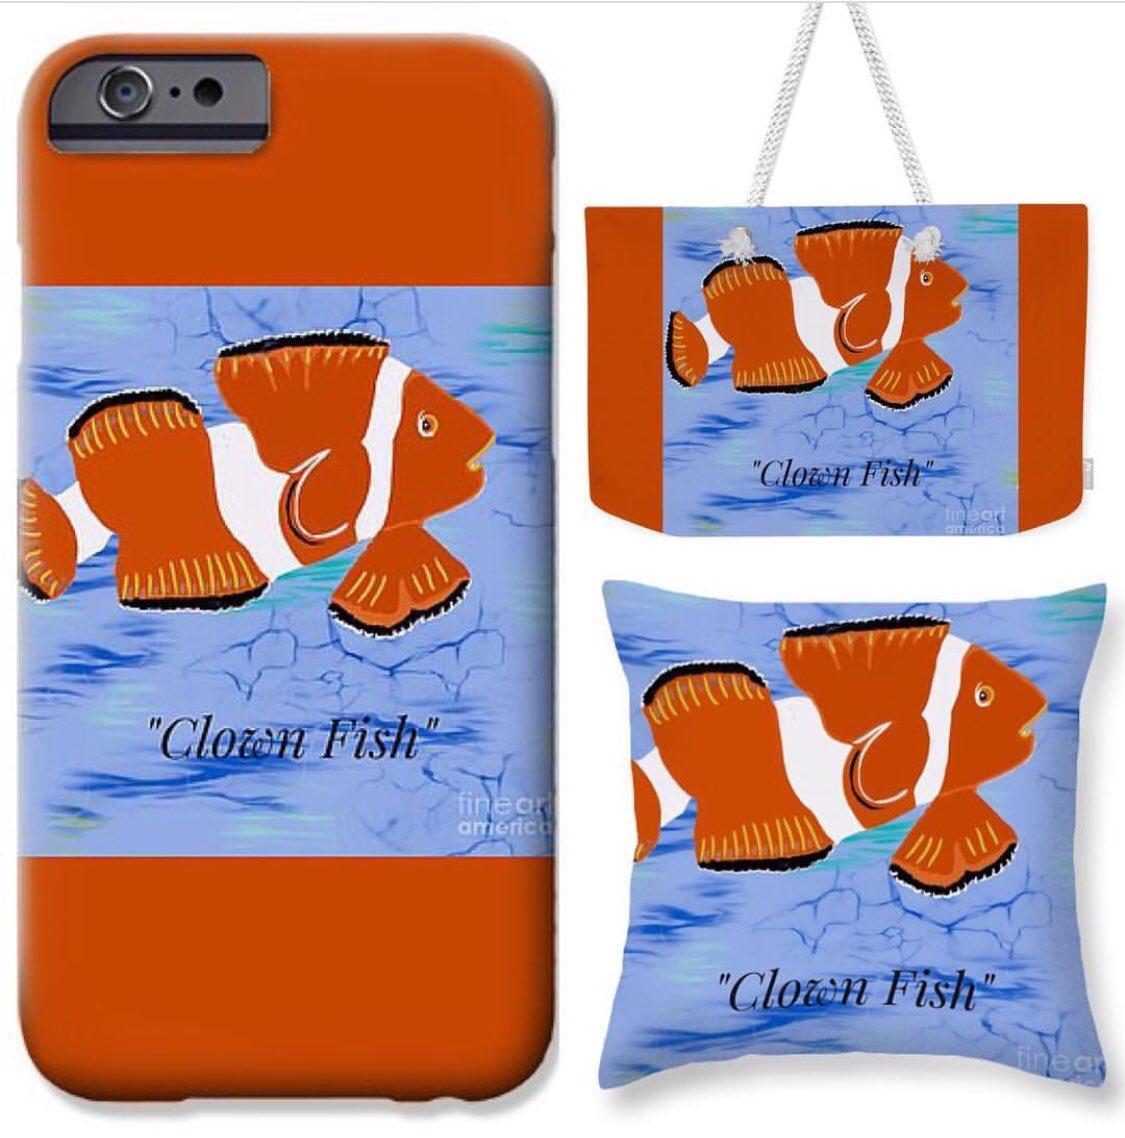 #ClownFish by Susan Garren On Pixels  https://susan-garren.pixels.com/featured/clown-fish-illustration-susan-garren.html…  #IllustrationGallery ♥️ #GiftIdeas🎁  #ToteBag #iPhoneCase #TravelItems #WearableArt #Design